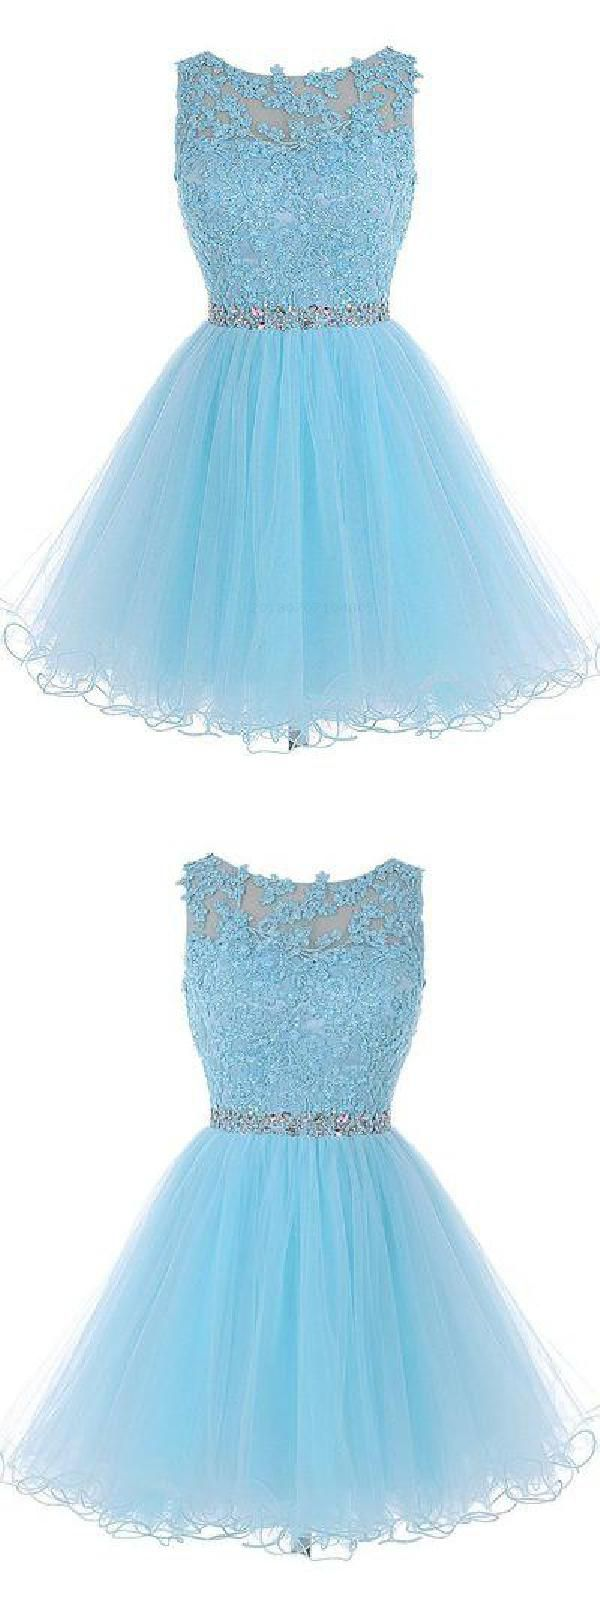 Discount nice short homecoming dress blue homecoming dress